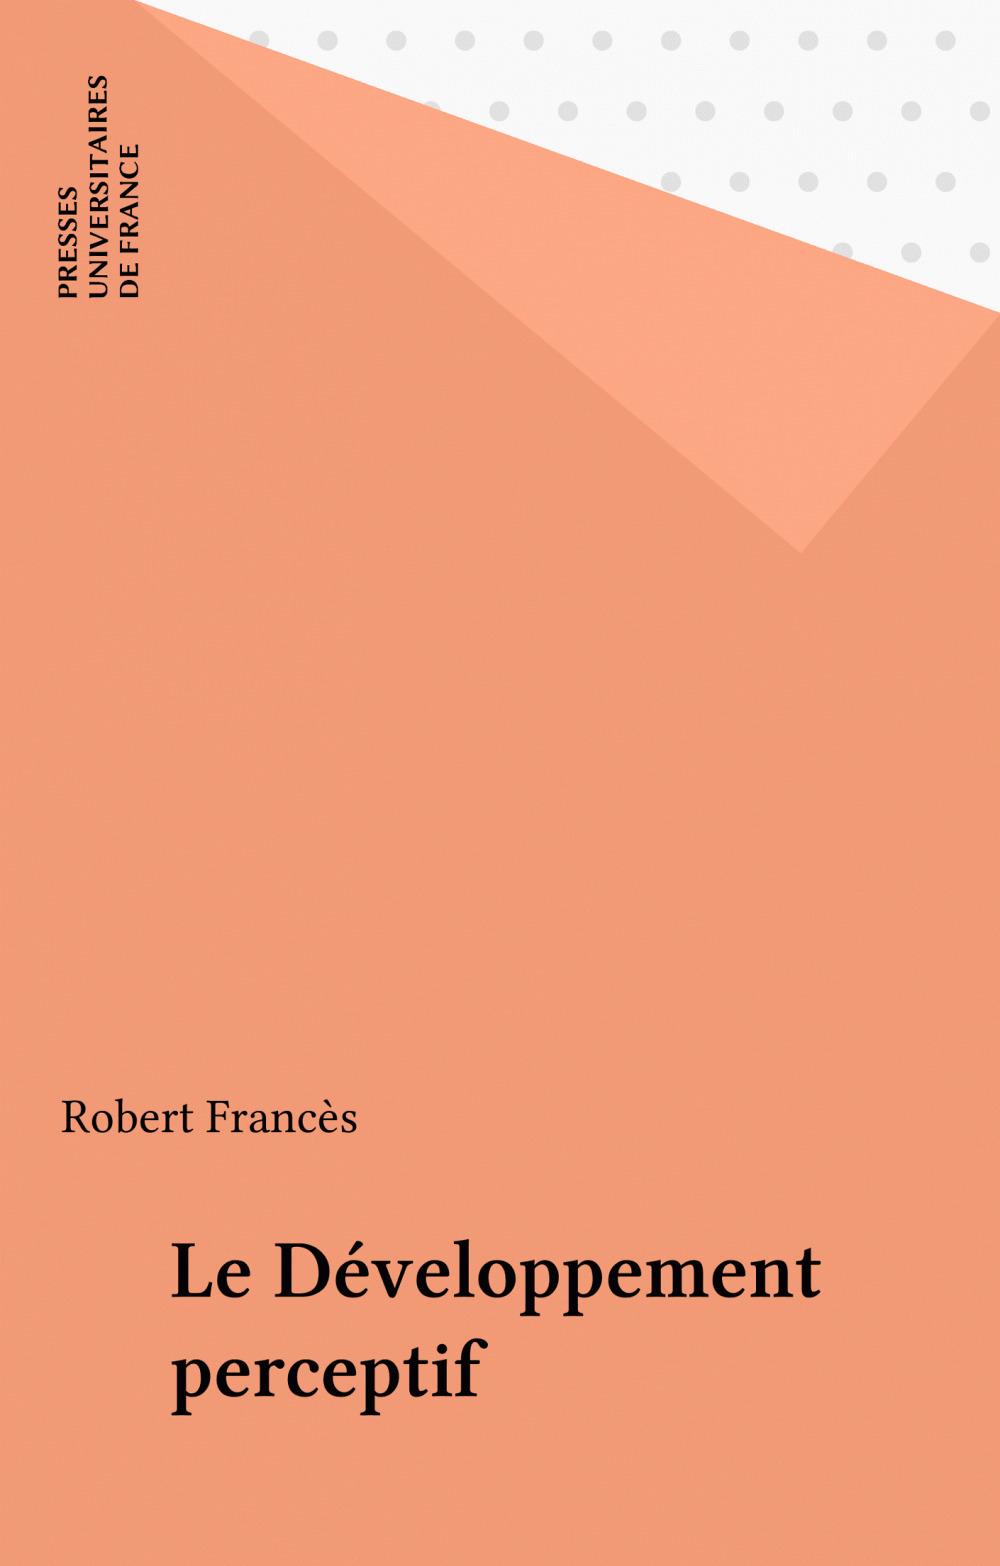 Robert Francès Le Développement perceptif